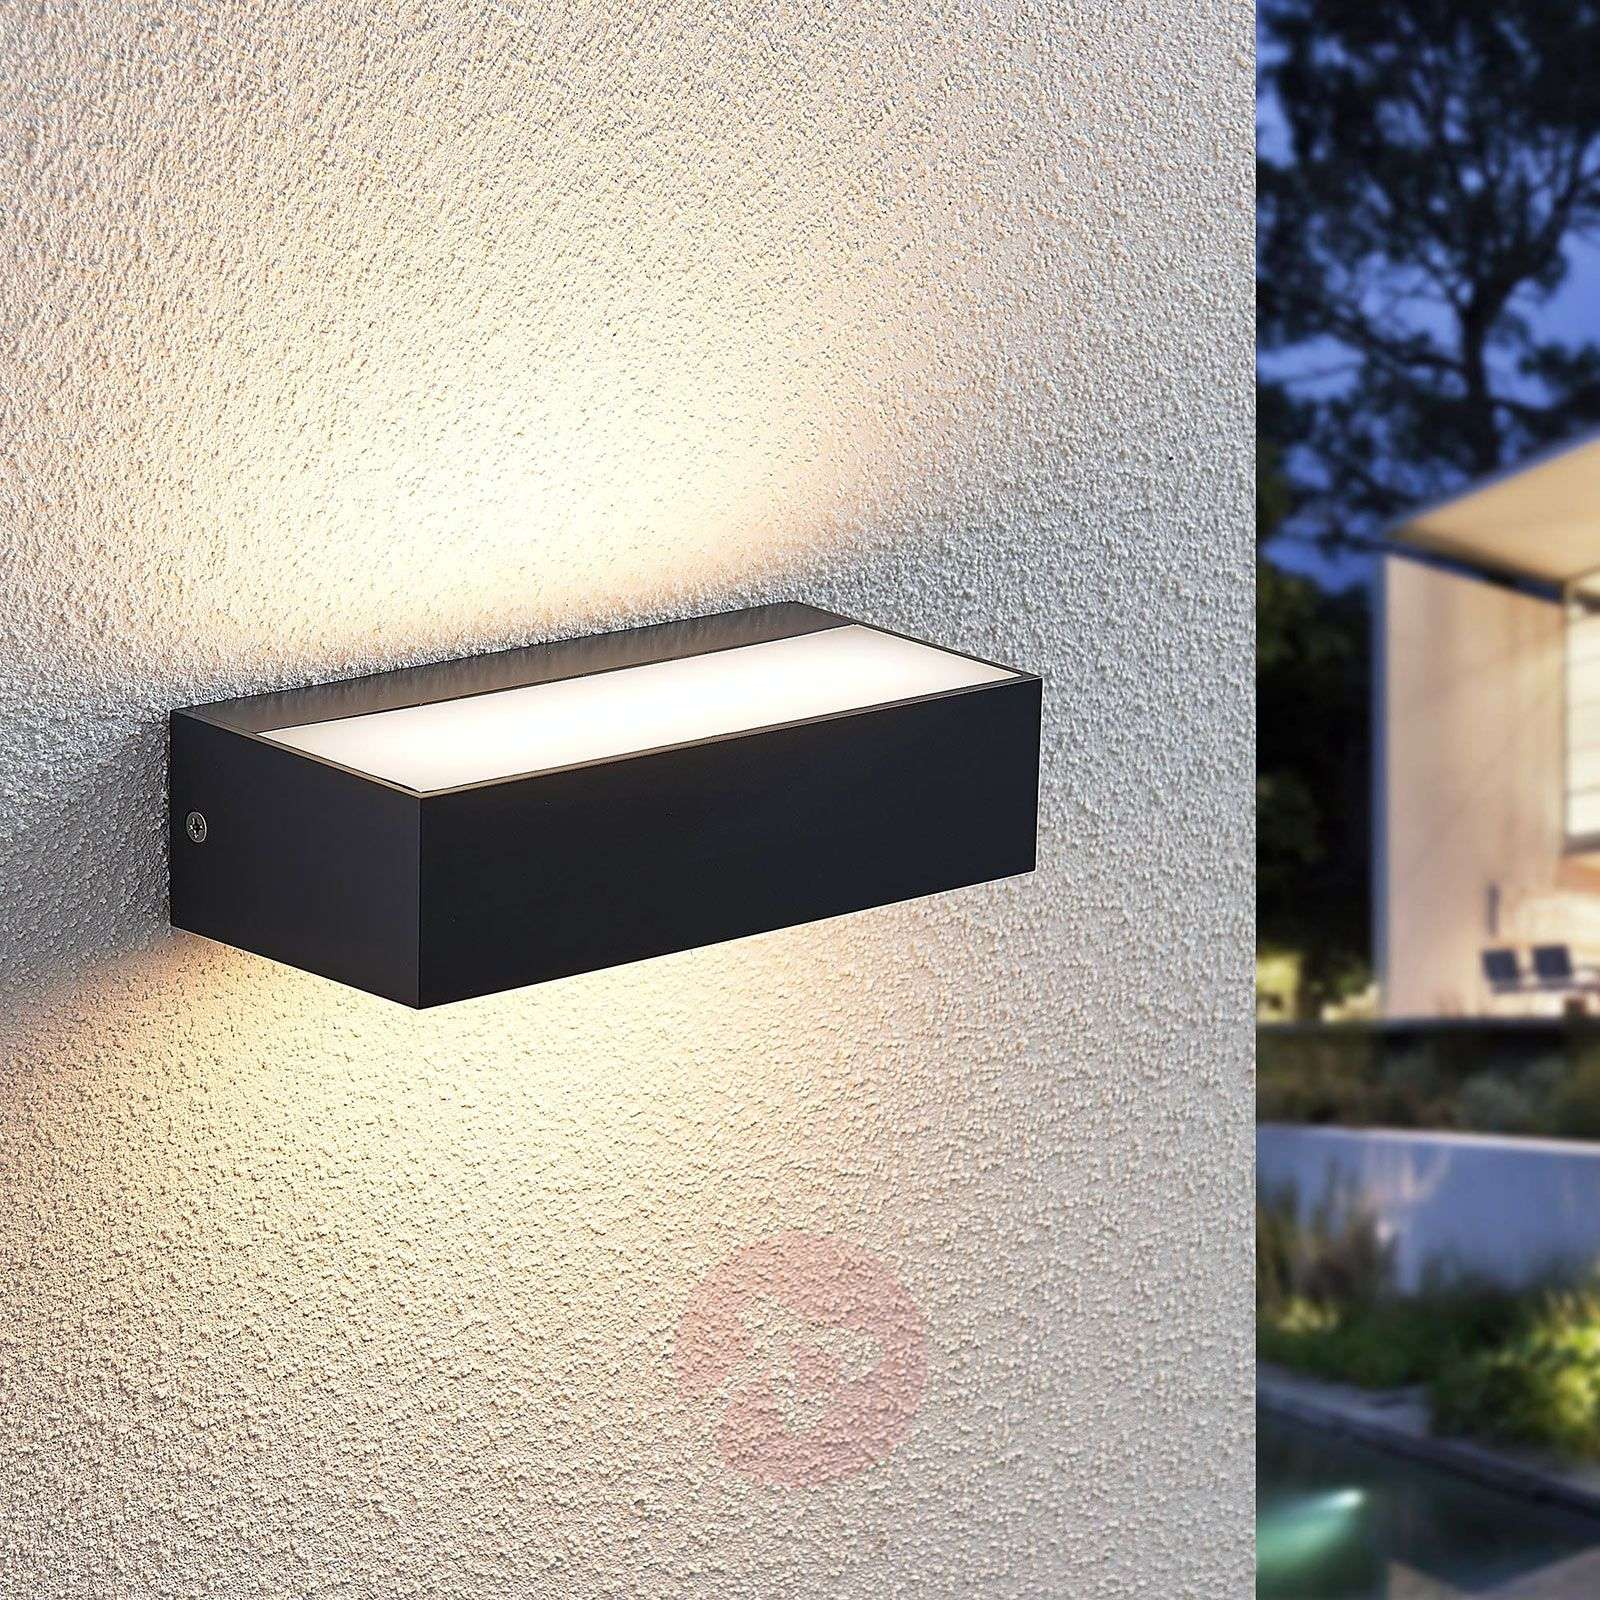 LED-ulkoseinävalaisin Nienke, IP65, 17 cm-9949001-01